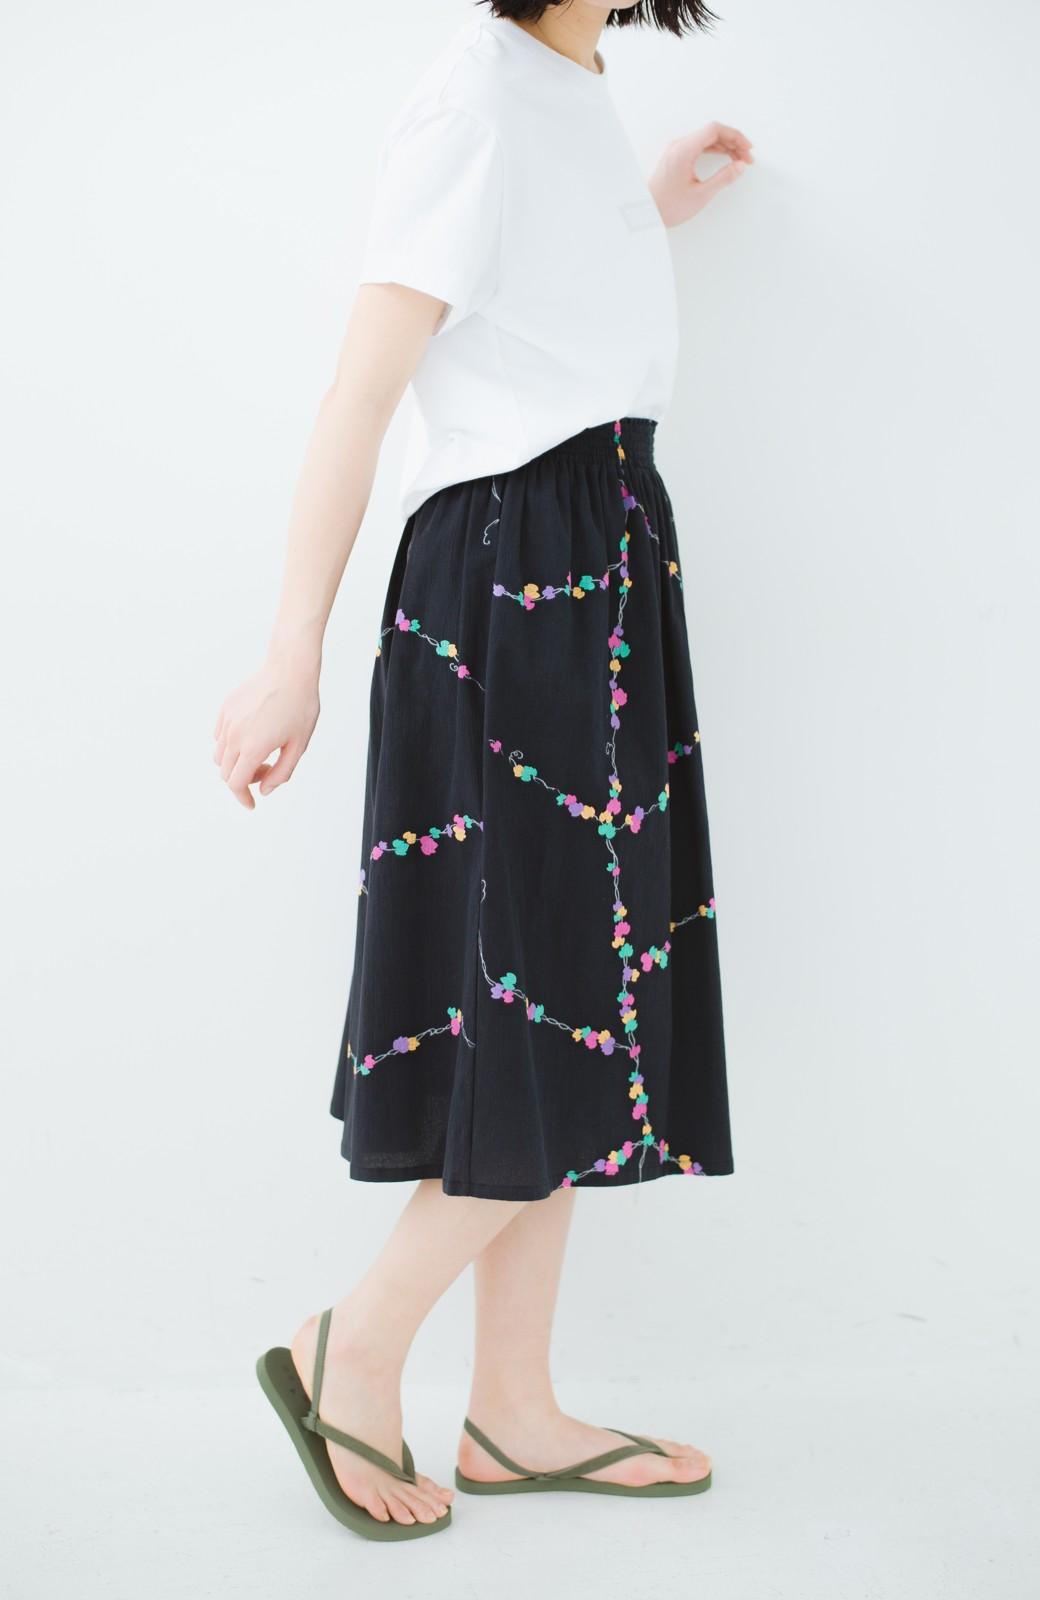 haco! 京都の浴衣屋さんと作った浴衣生地のスカート <ブラック系その他>の商品写真15